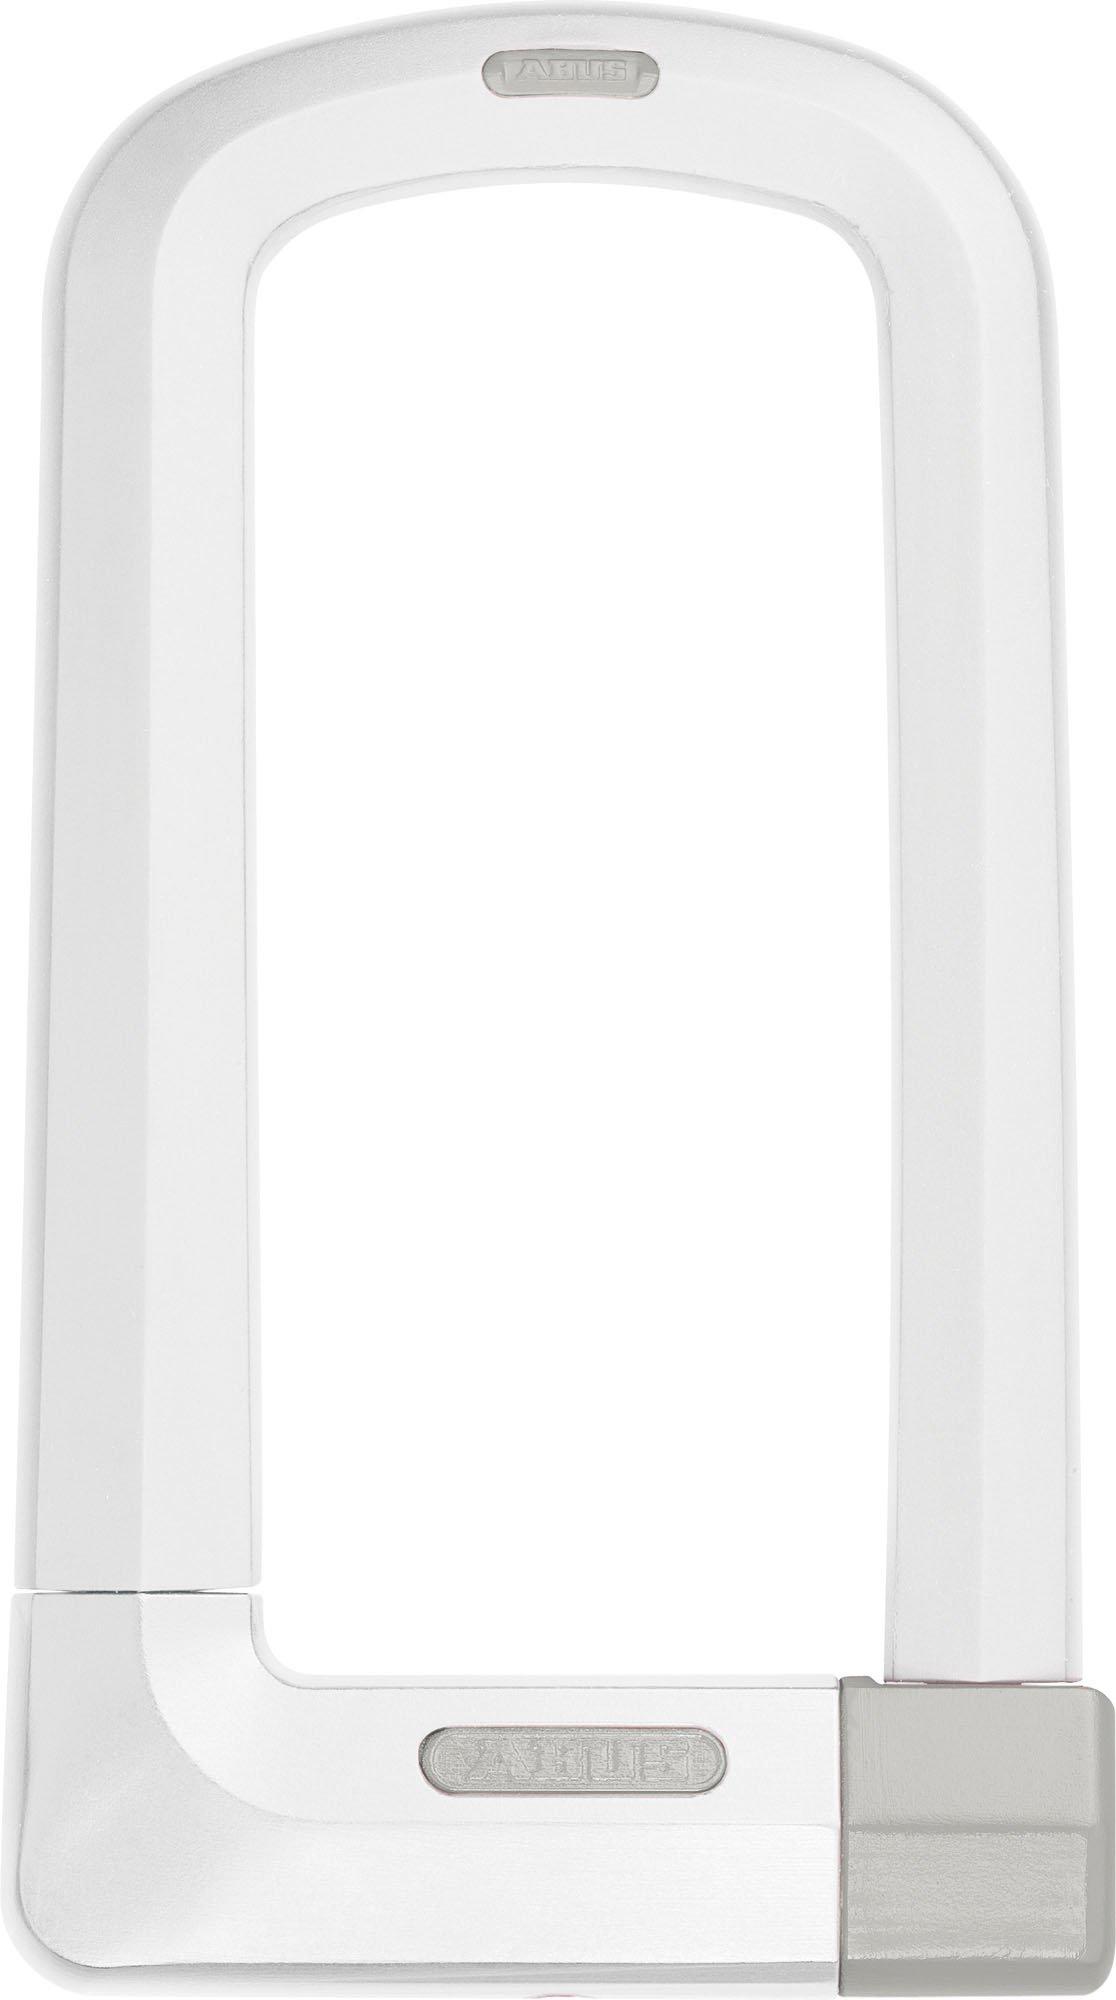 ABUS 501 Granit uGrip Plus D Lock bike combination white